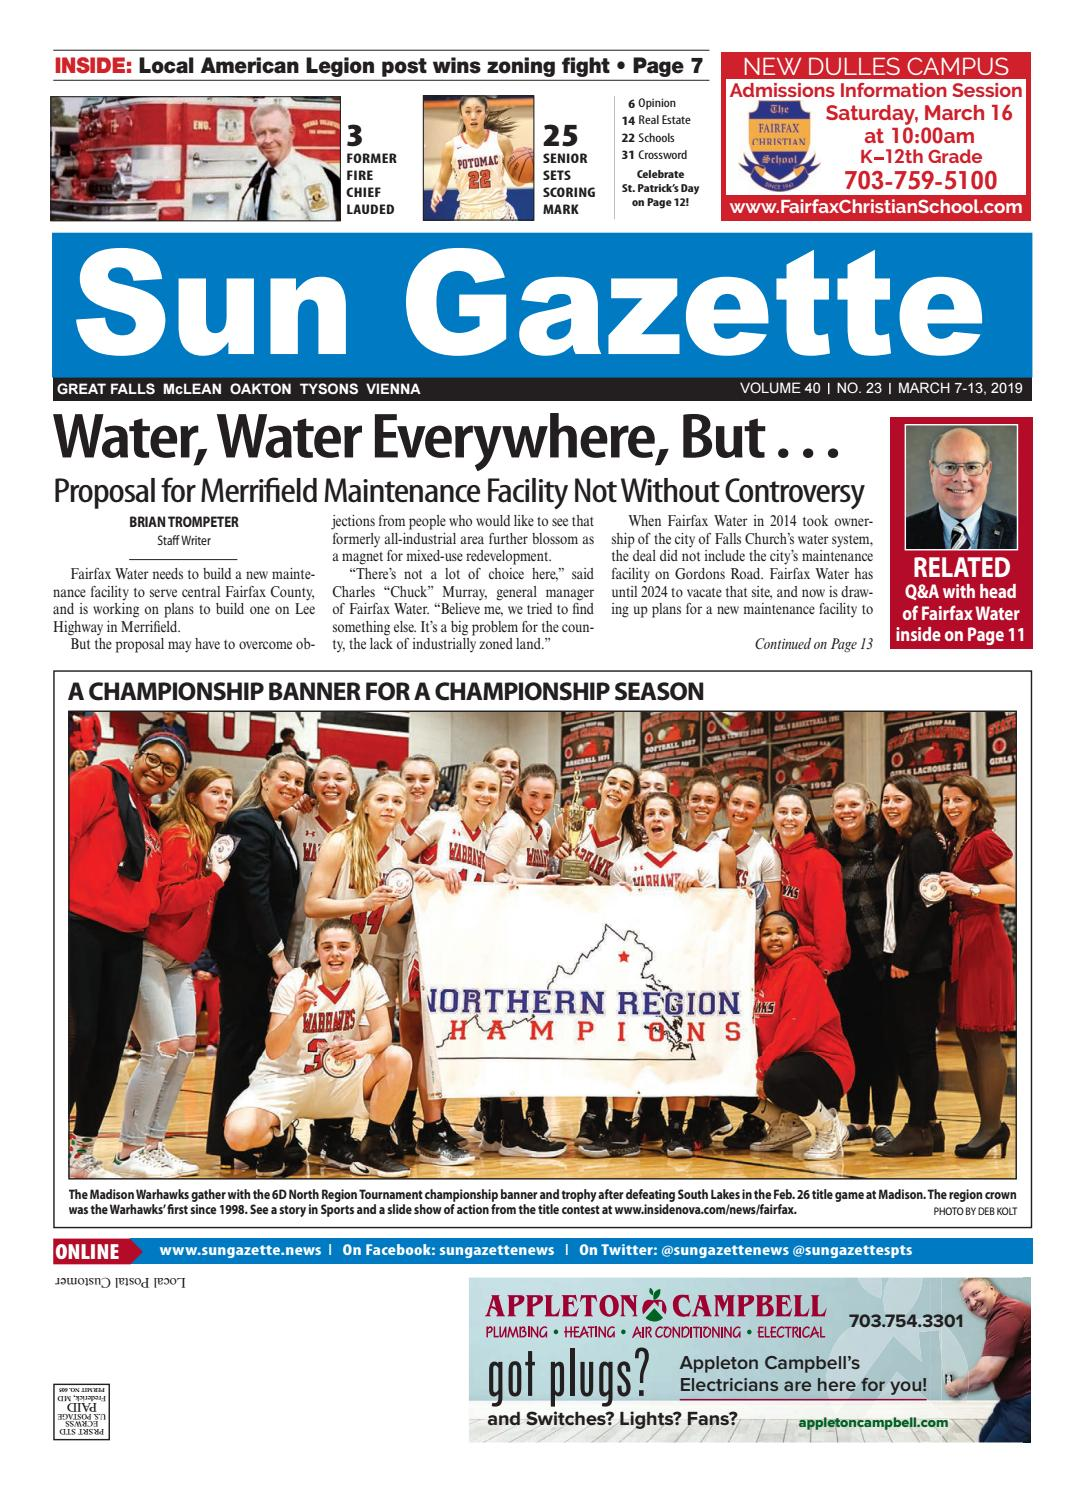 Great Falls, McLean, Oakton and Vienna Sun Gazette by